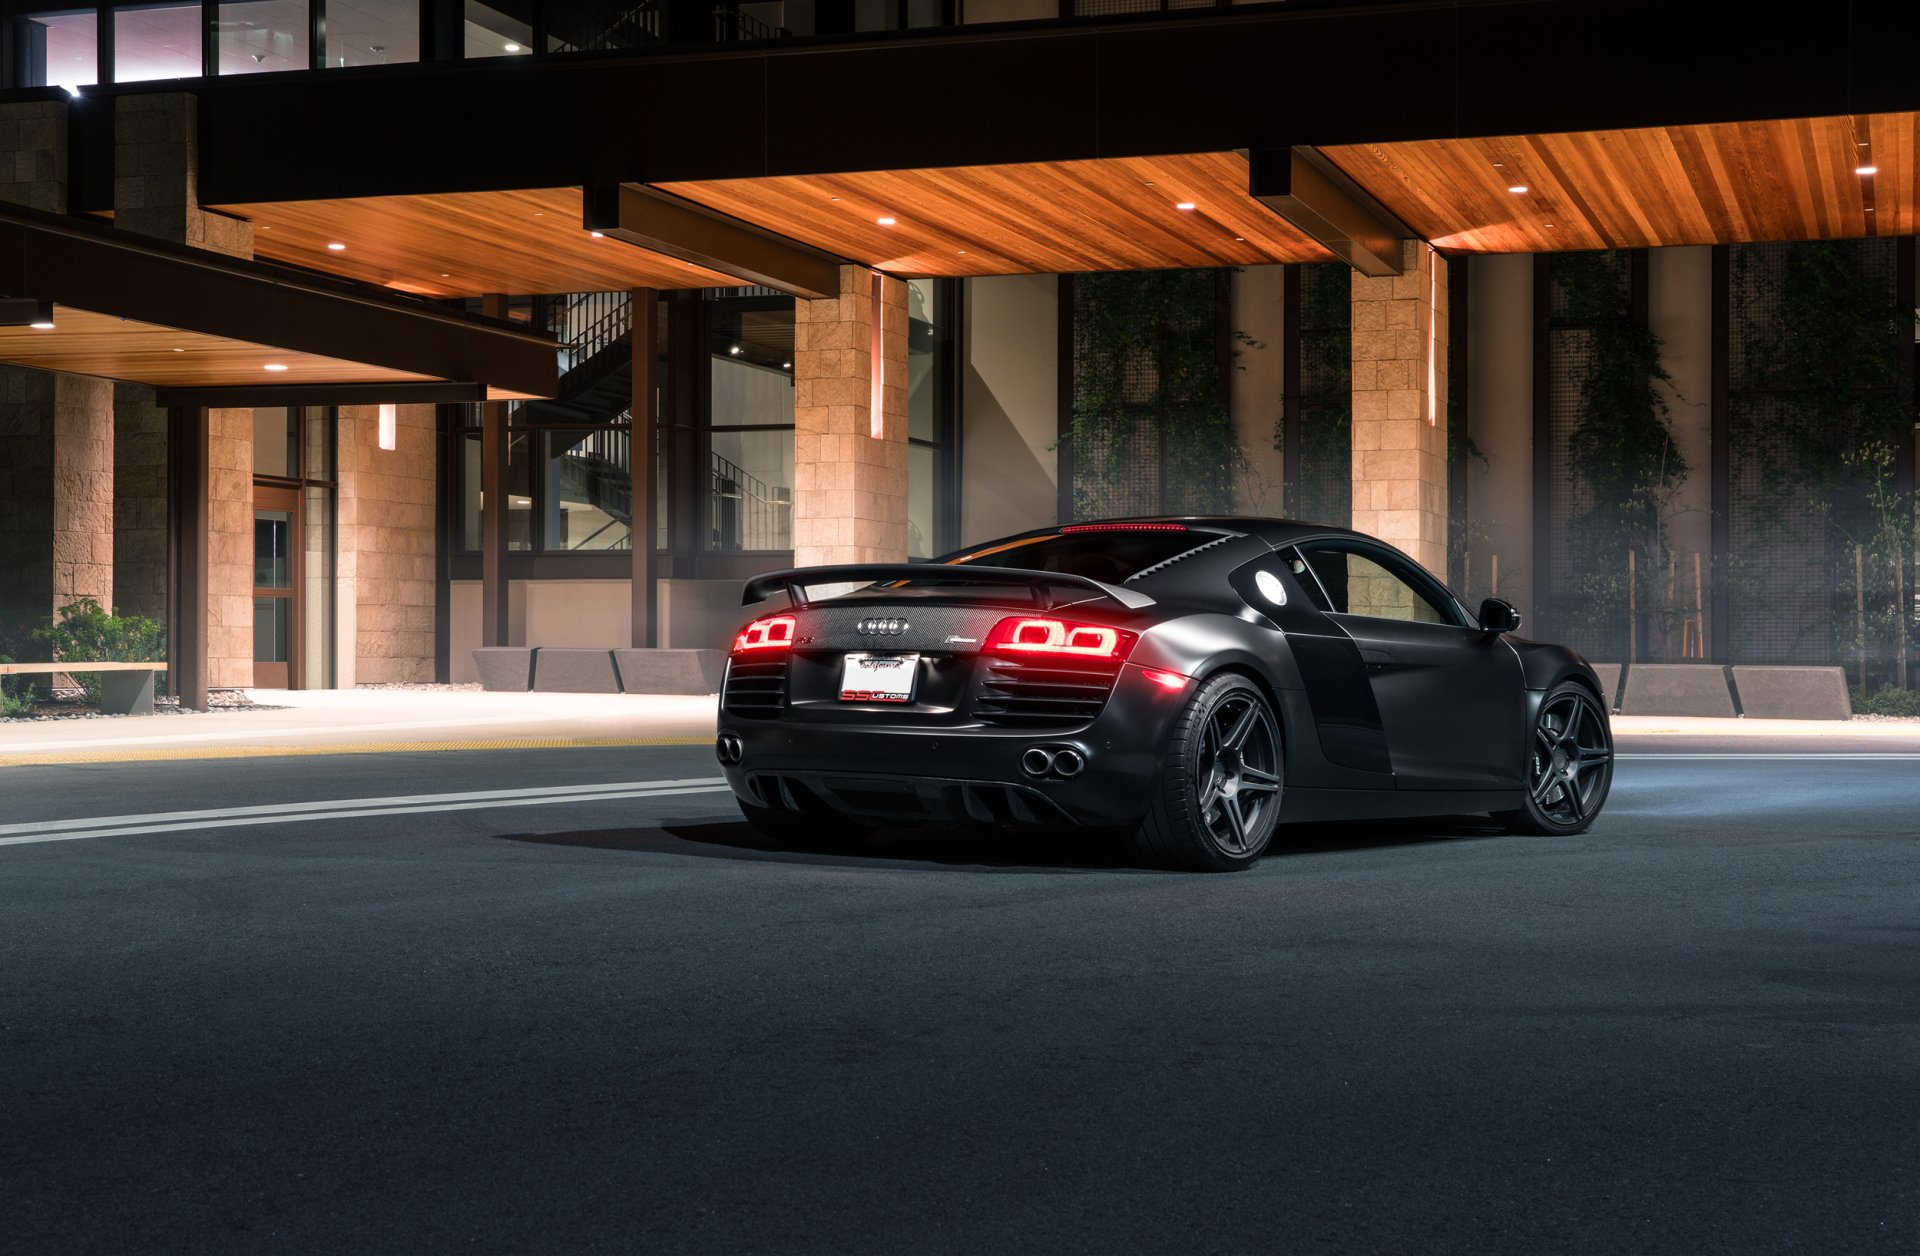 Vehicles - Audi R8  Audi Supercar Sport Car Black Car Car Vehicle Wallpaper